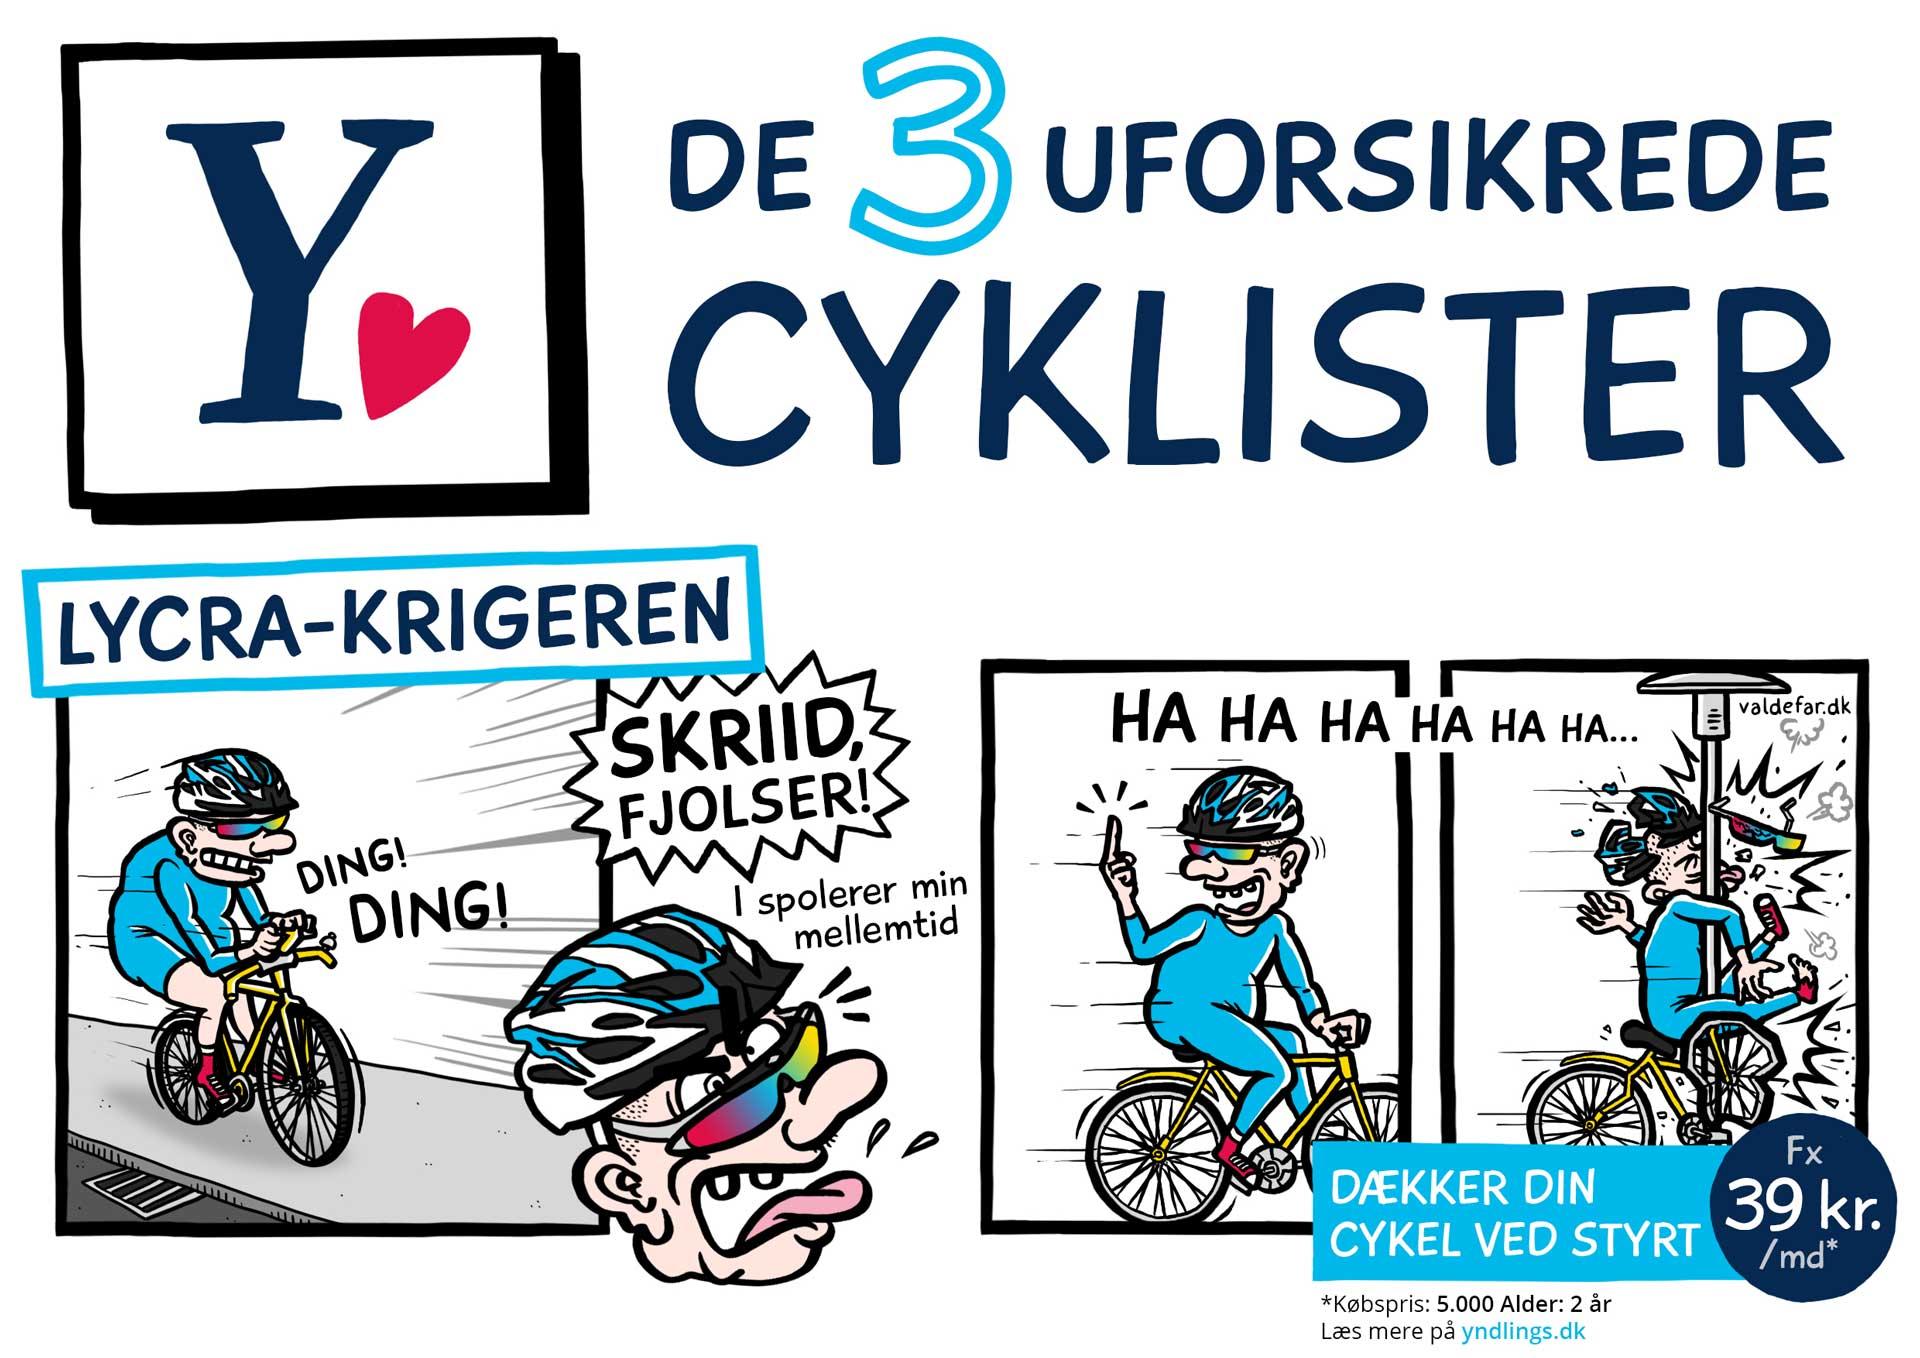 Tegneseriestriber for Alm Brand: De 3 uforsikrede cyklister / Lycra-krigeren